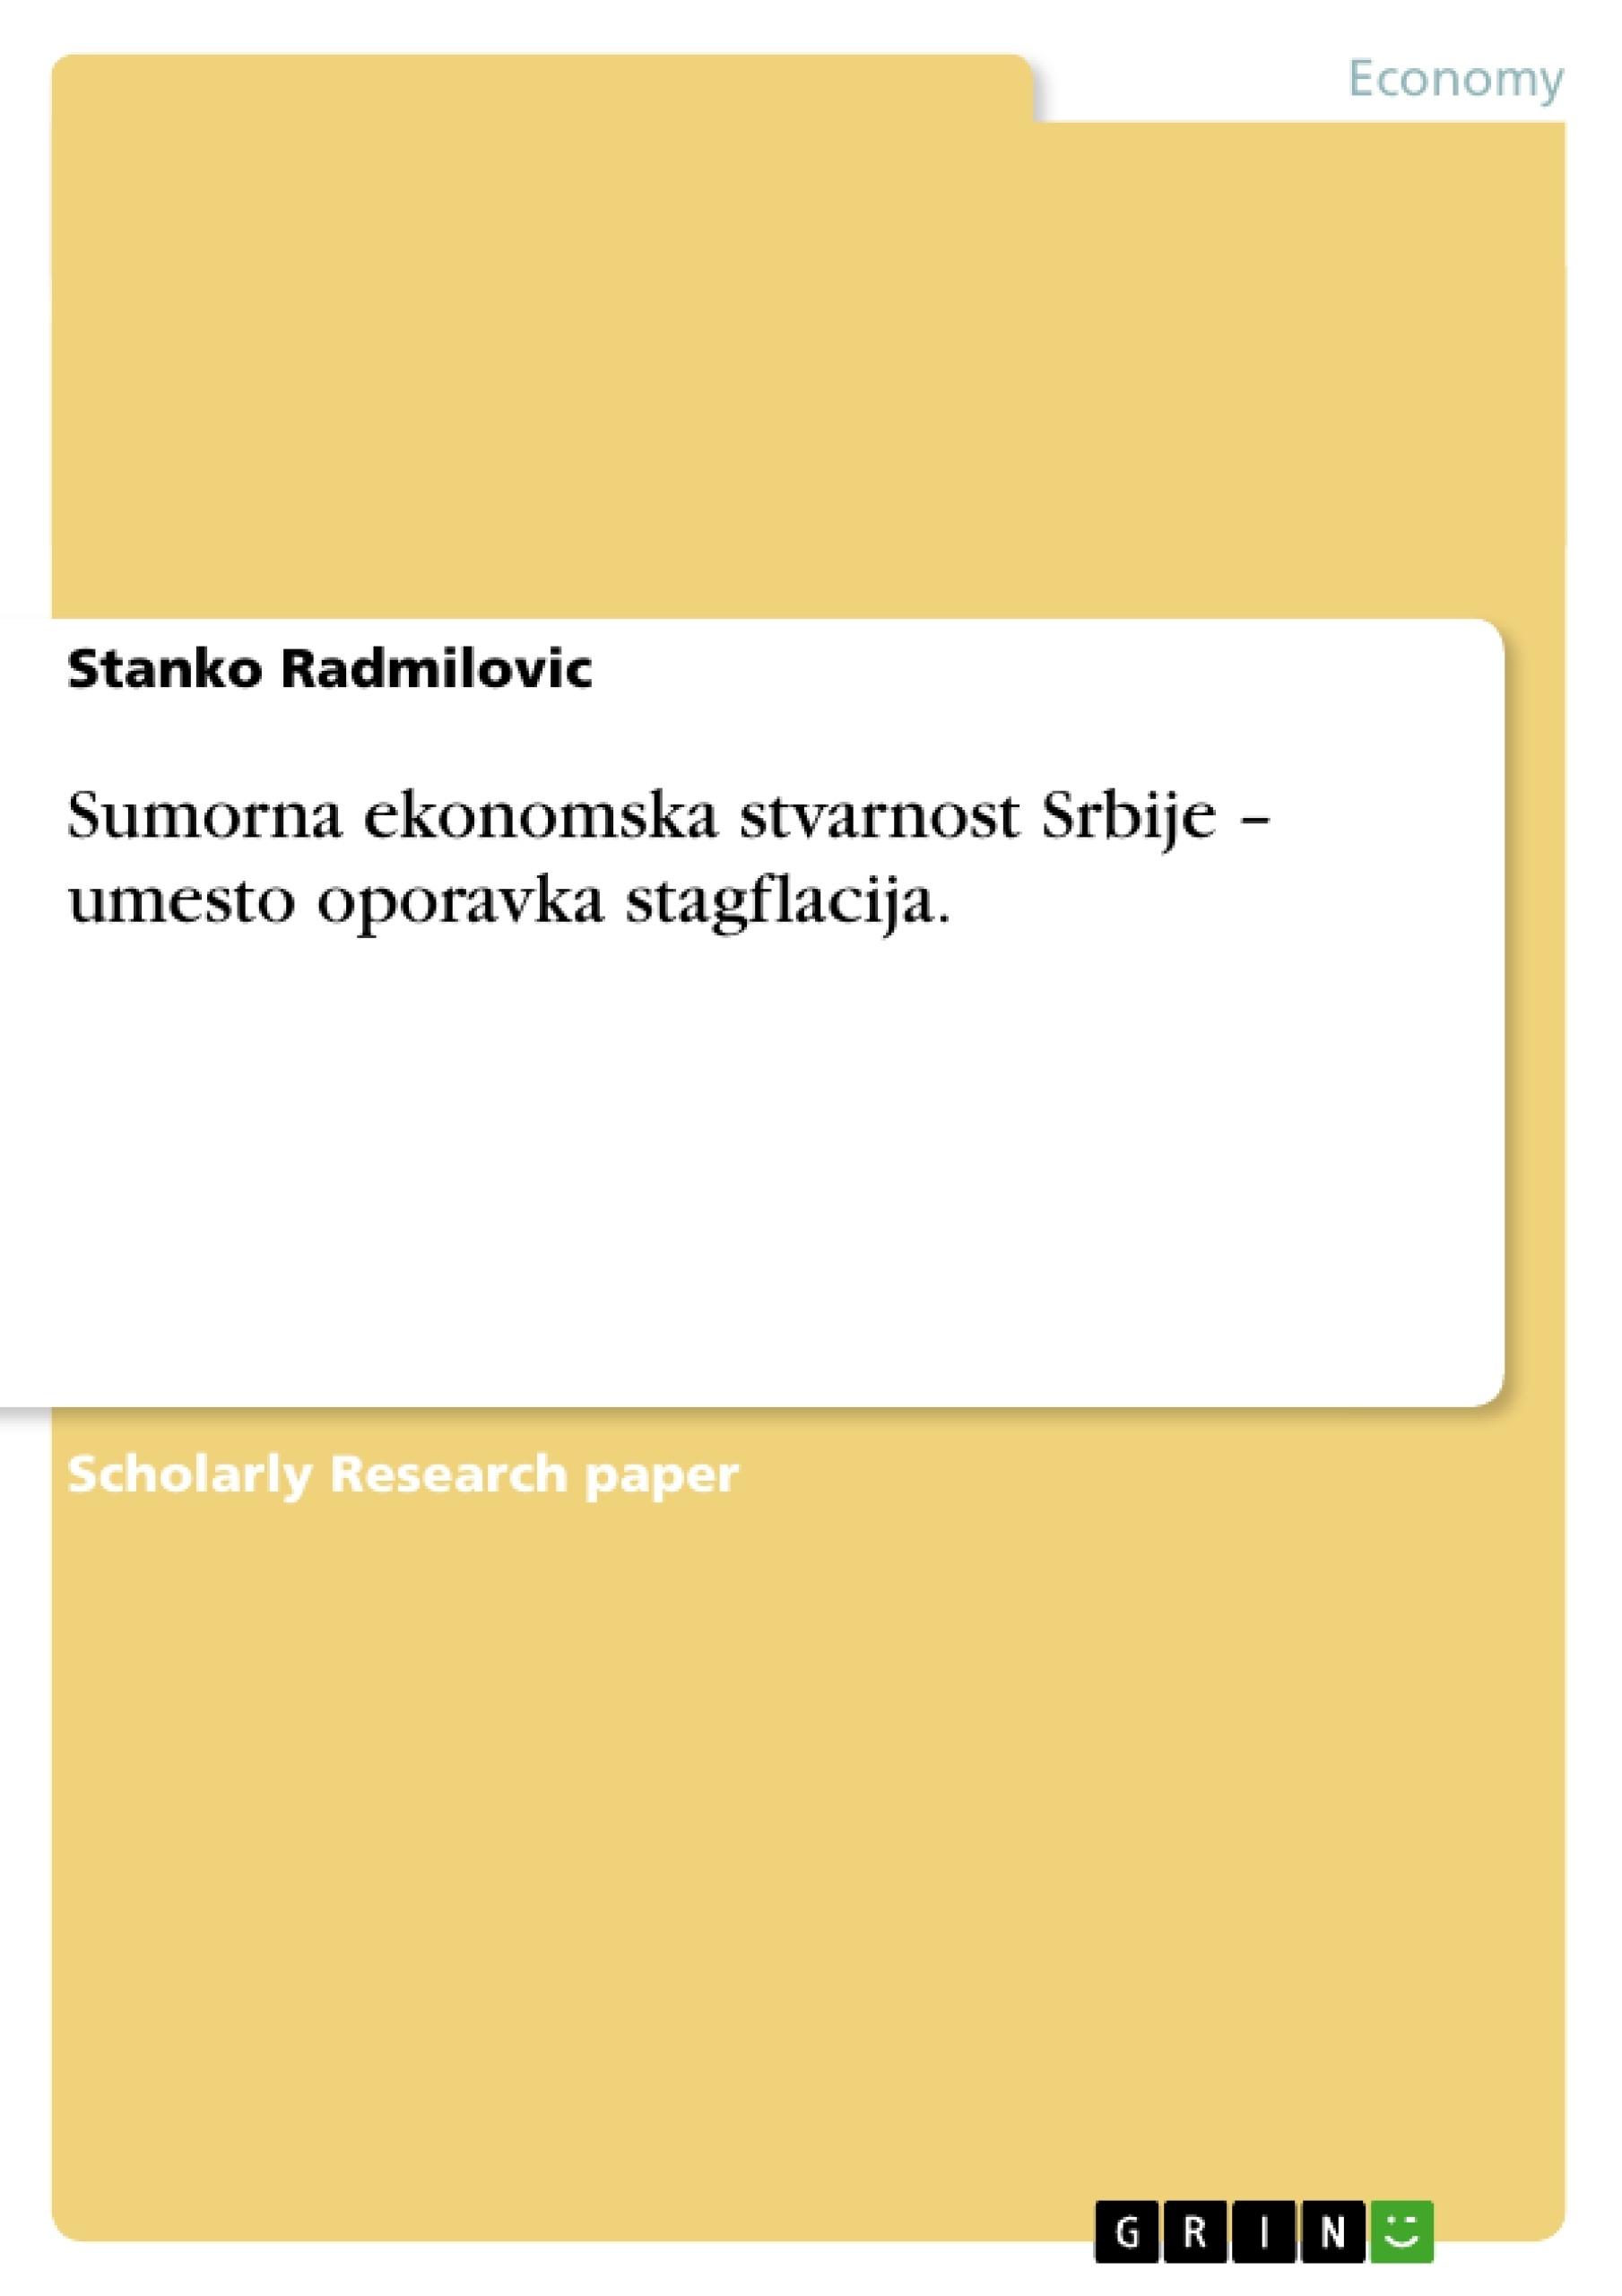 Title: Sumorna ekonomska stvarnost Srbije – umesto oporavka stagflacija.